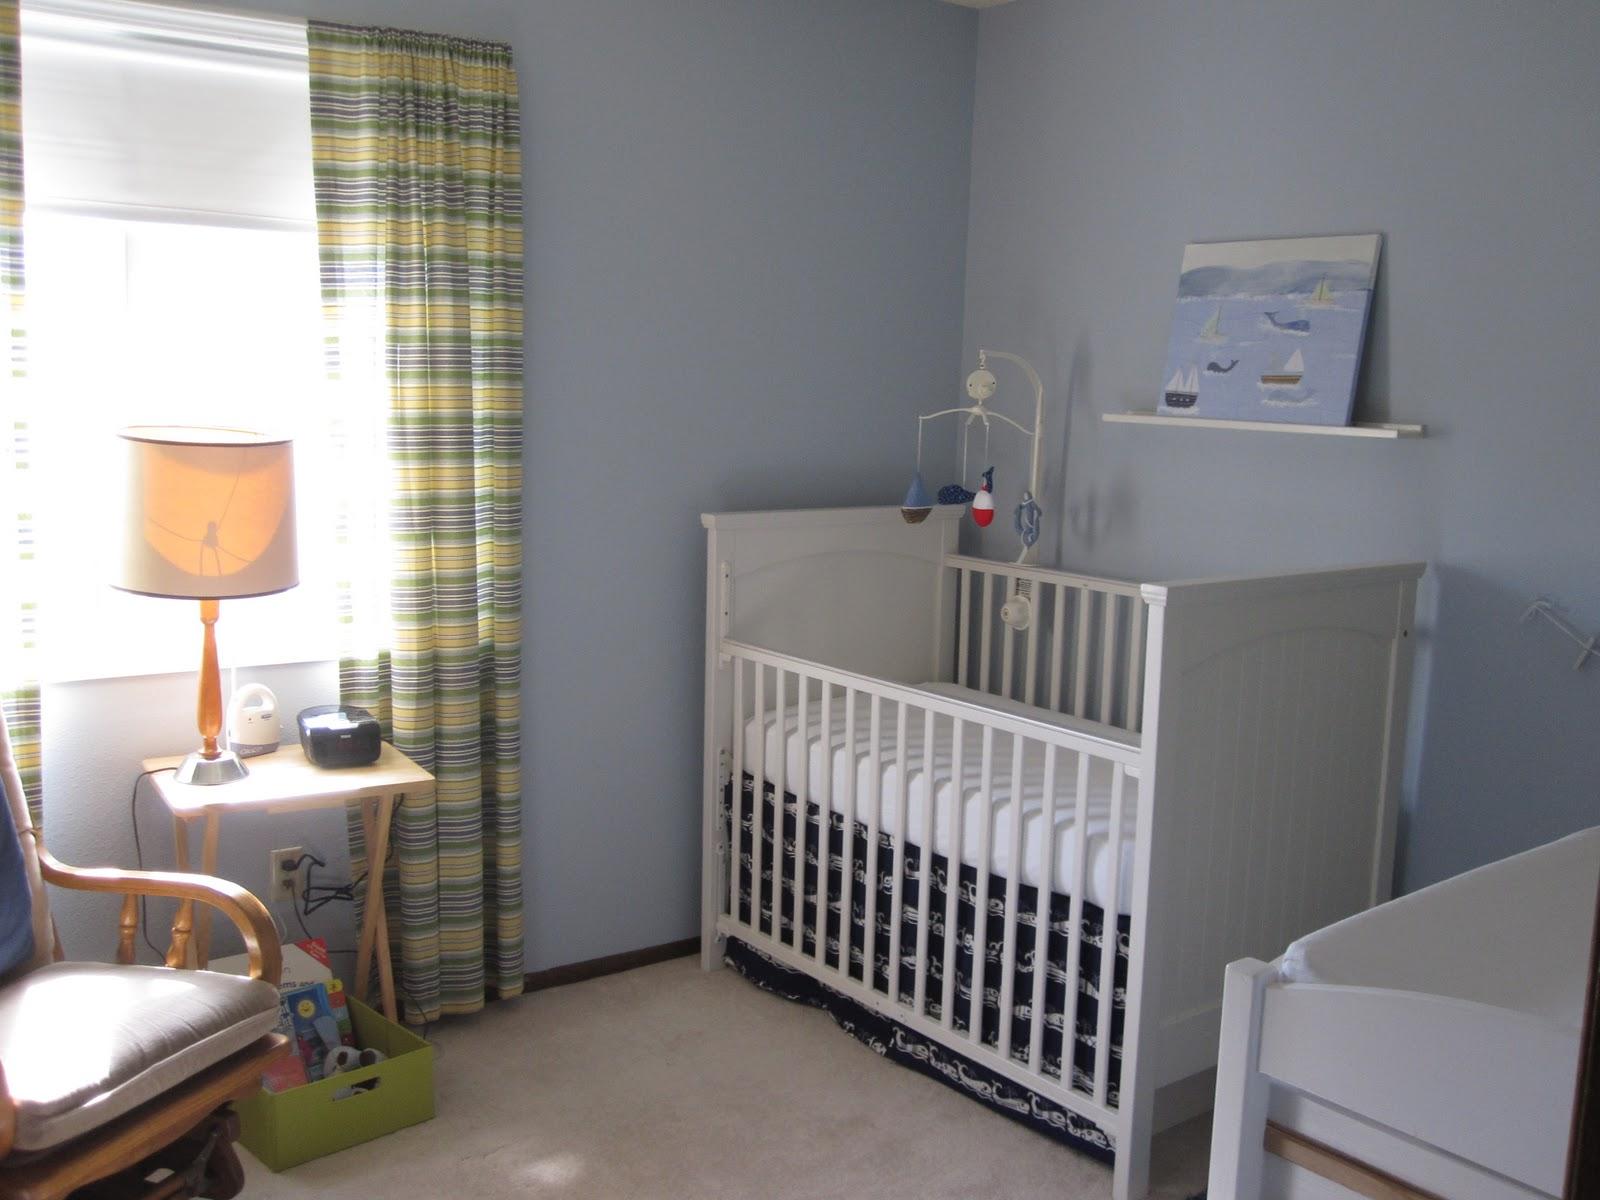 Baby room curtain styles - Boy Nursery Curtains Orange Curtains For Nursery Baby Room Curtain Styles Wednesday September 29 Boy